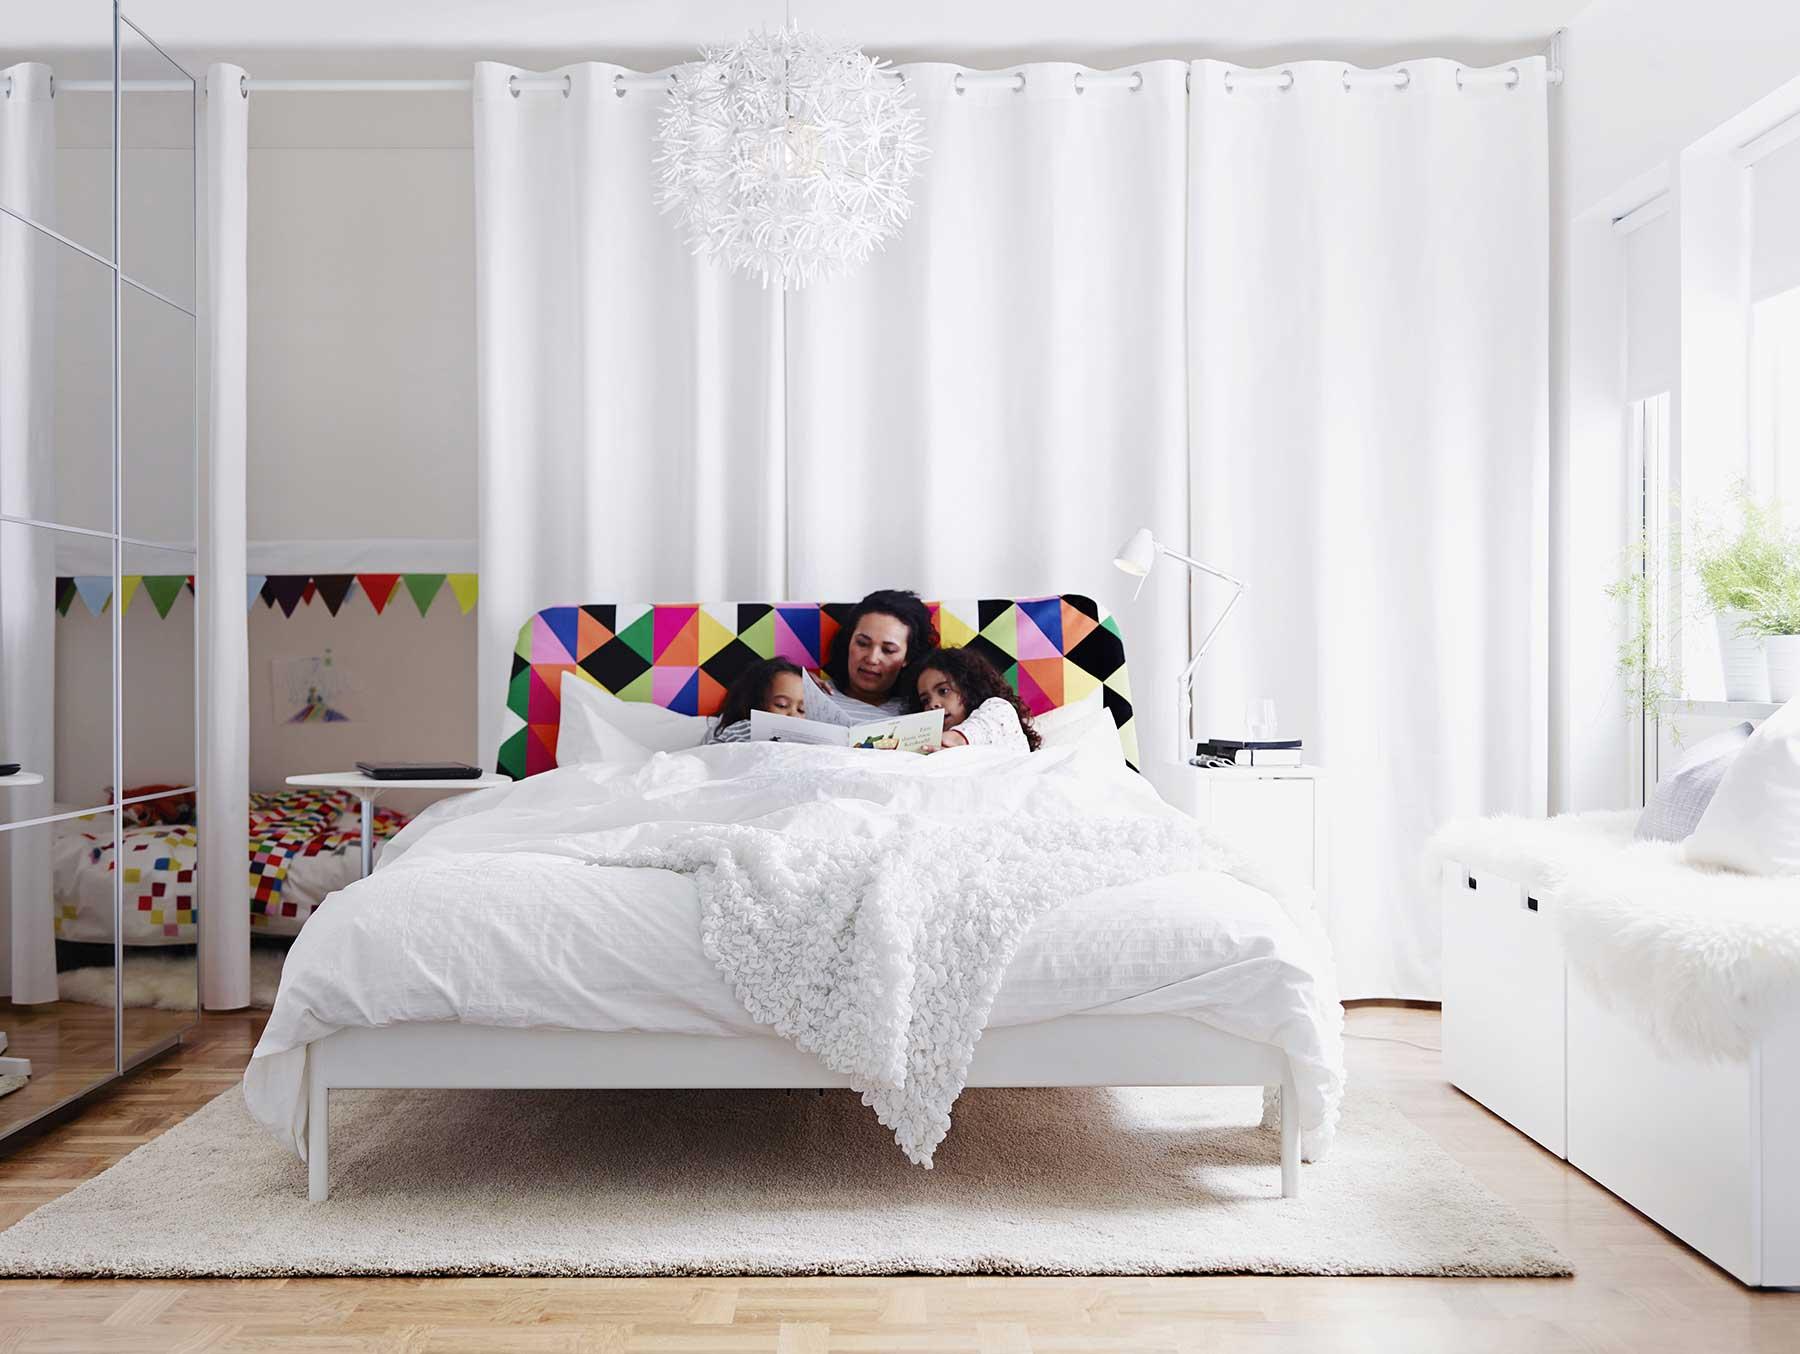 chambre ikea catalogue 2015. Black Bedroom Furniture Sets. Home Design Ideas